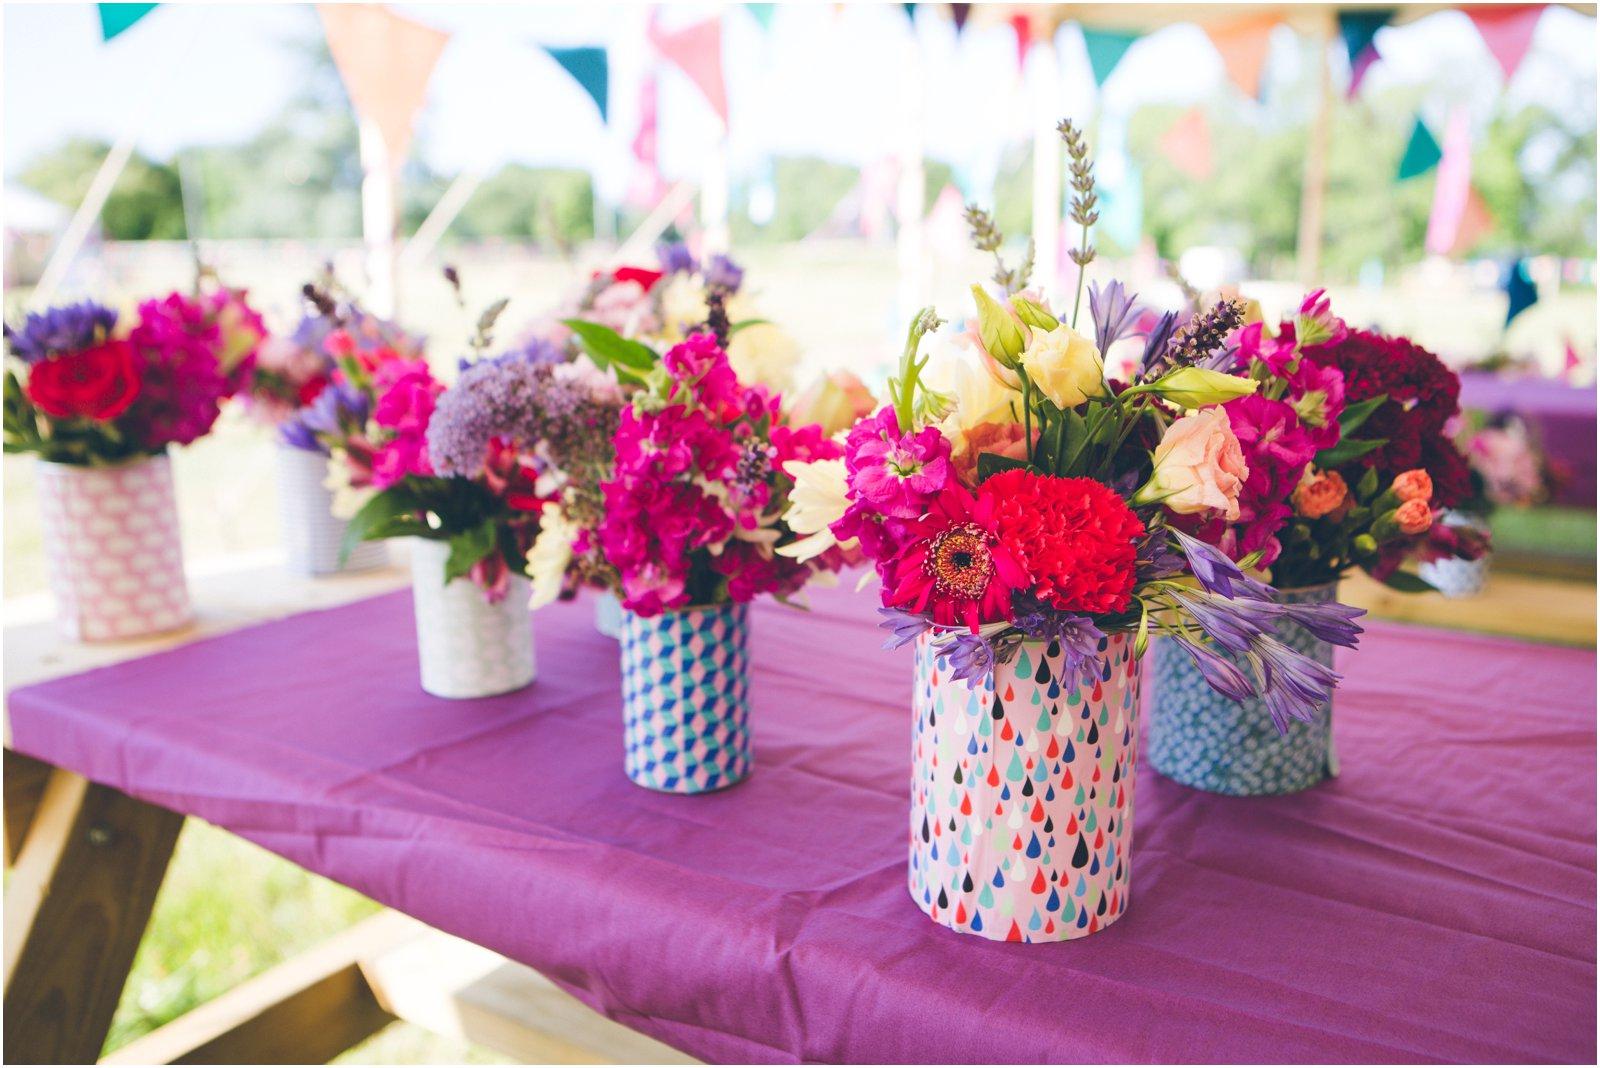 Sally and Damien's wedding festival by Summertown Pictures-10_DerrynSchmidt